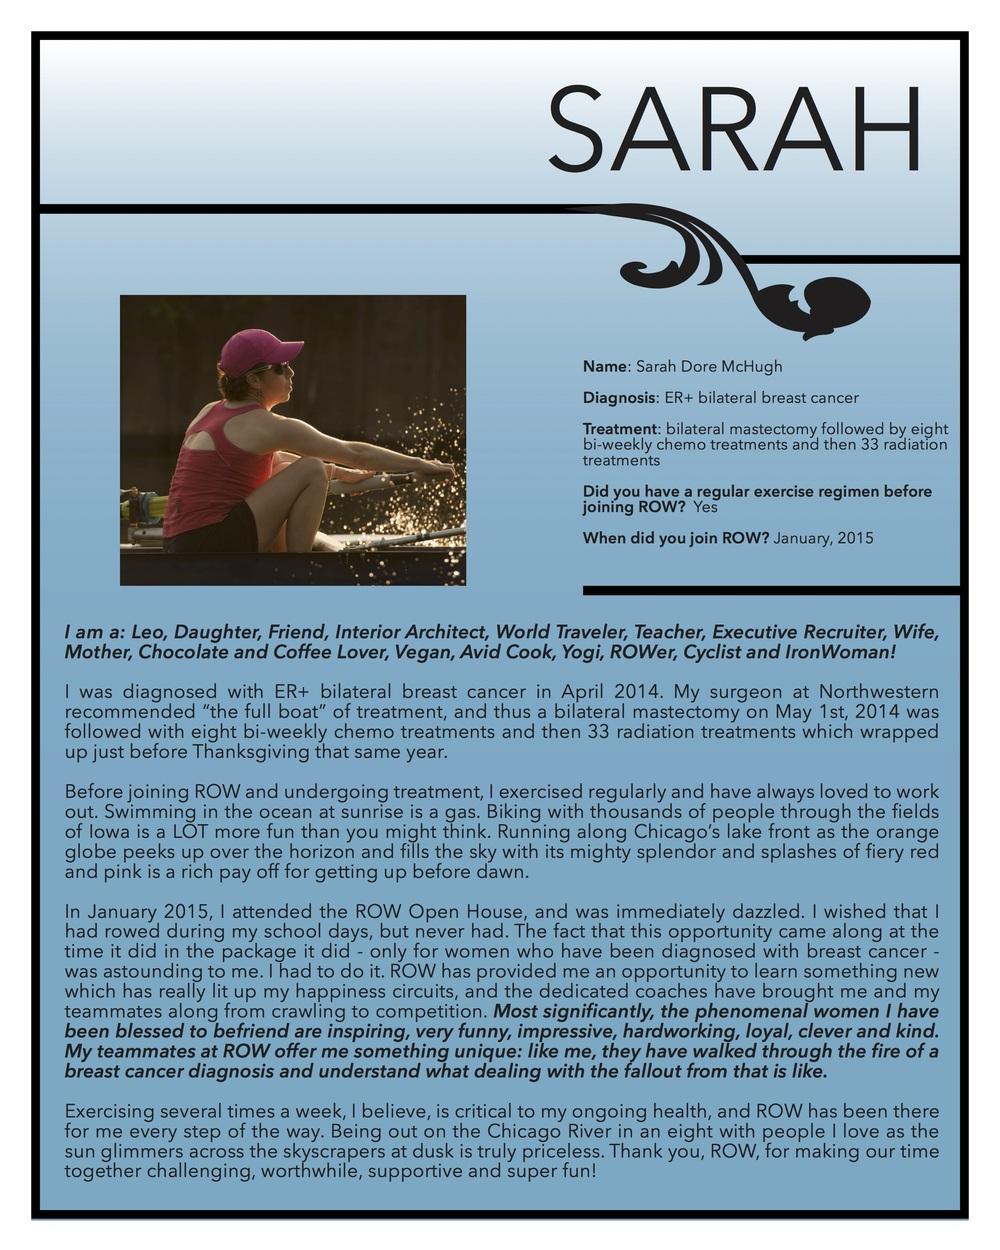 SarahMc_pROWfile (1).jpg